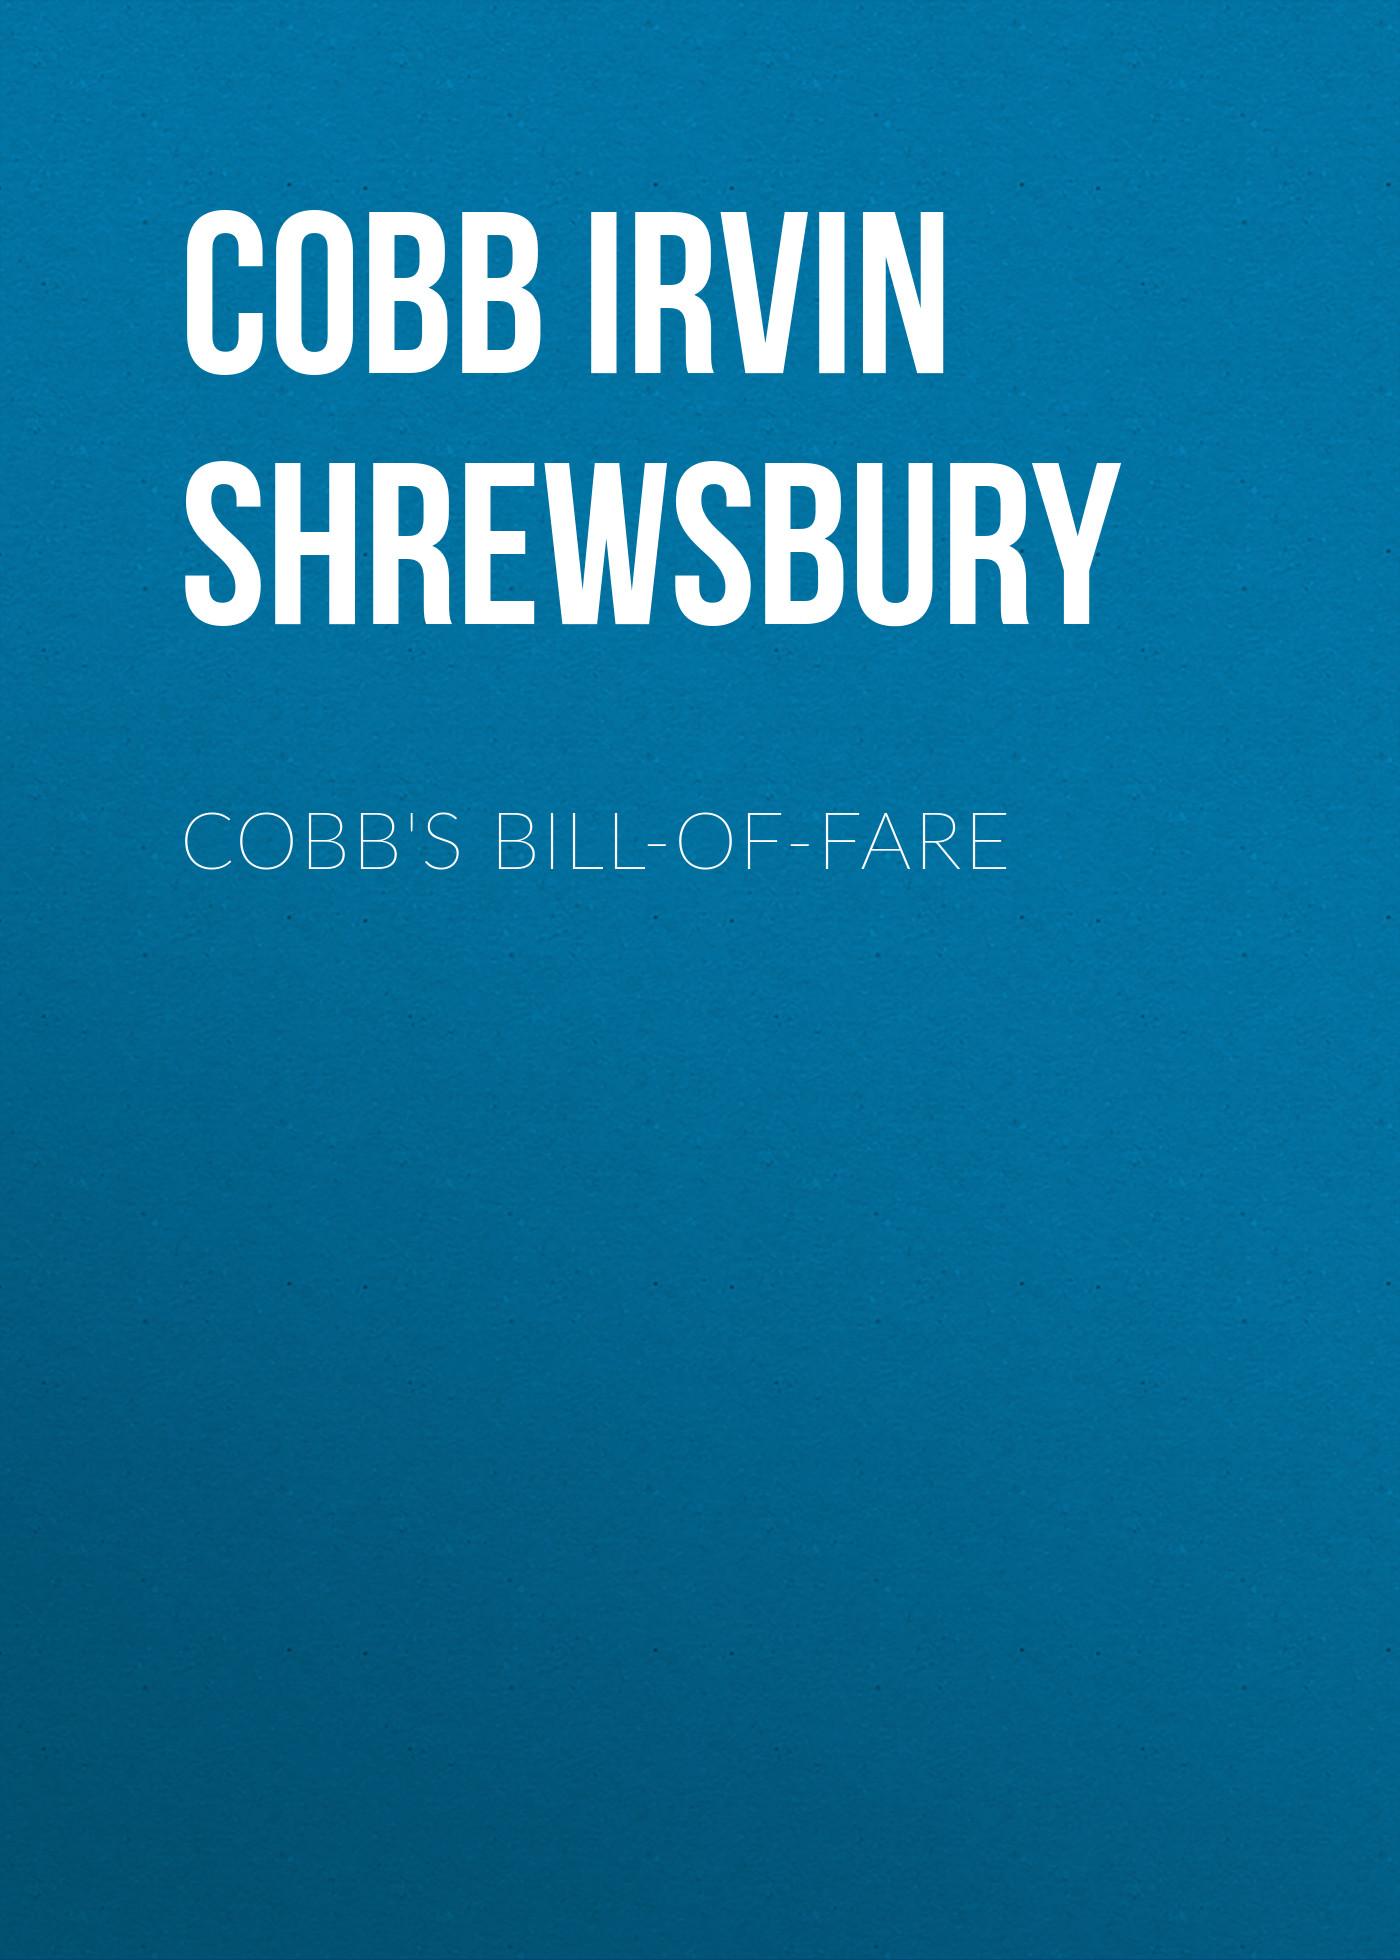 Cobb Irvin Shrewsbury Cobb's Bill-of-Fare vincent cobb revelation